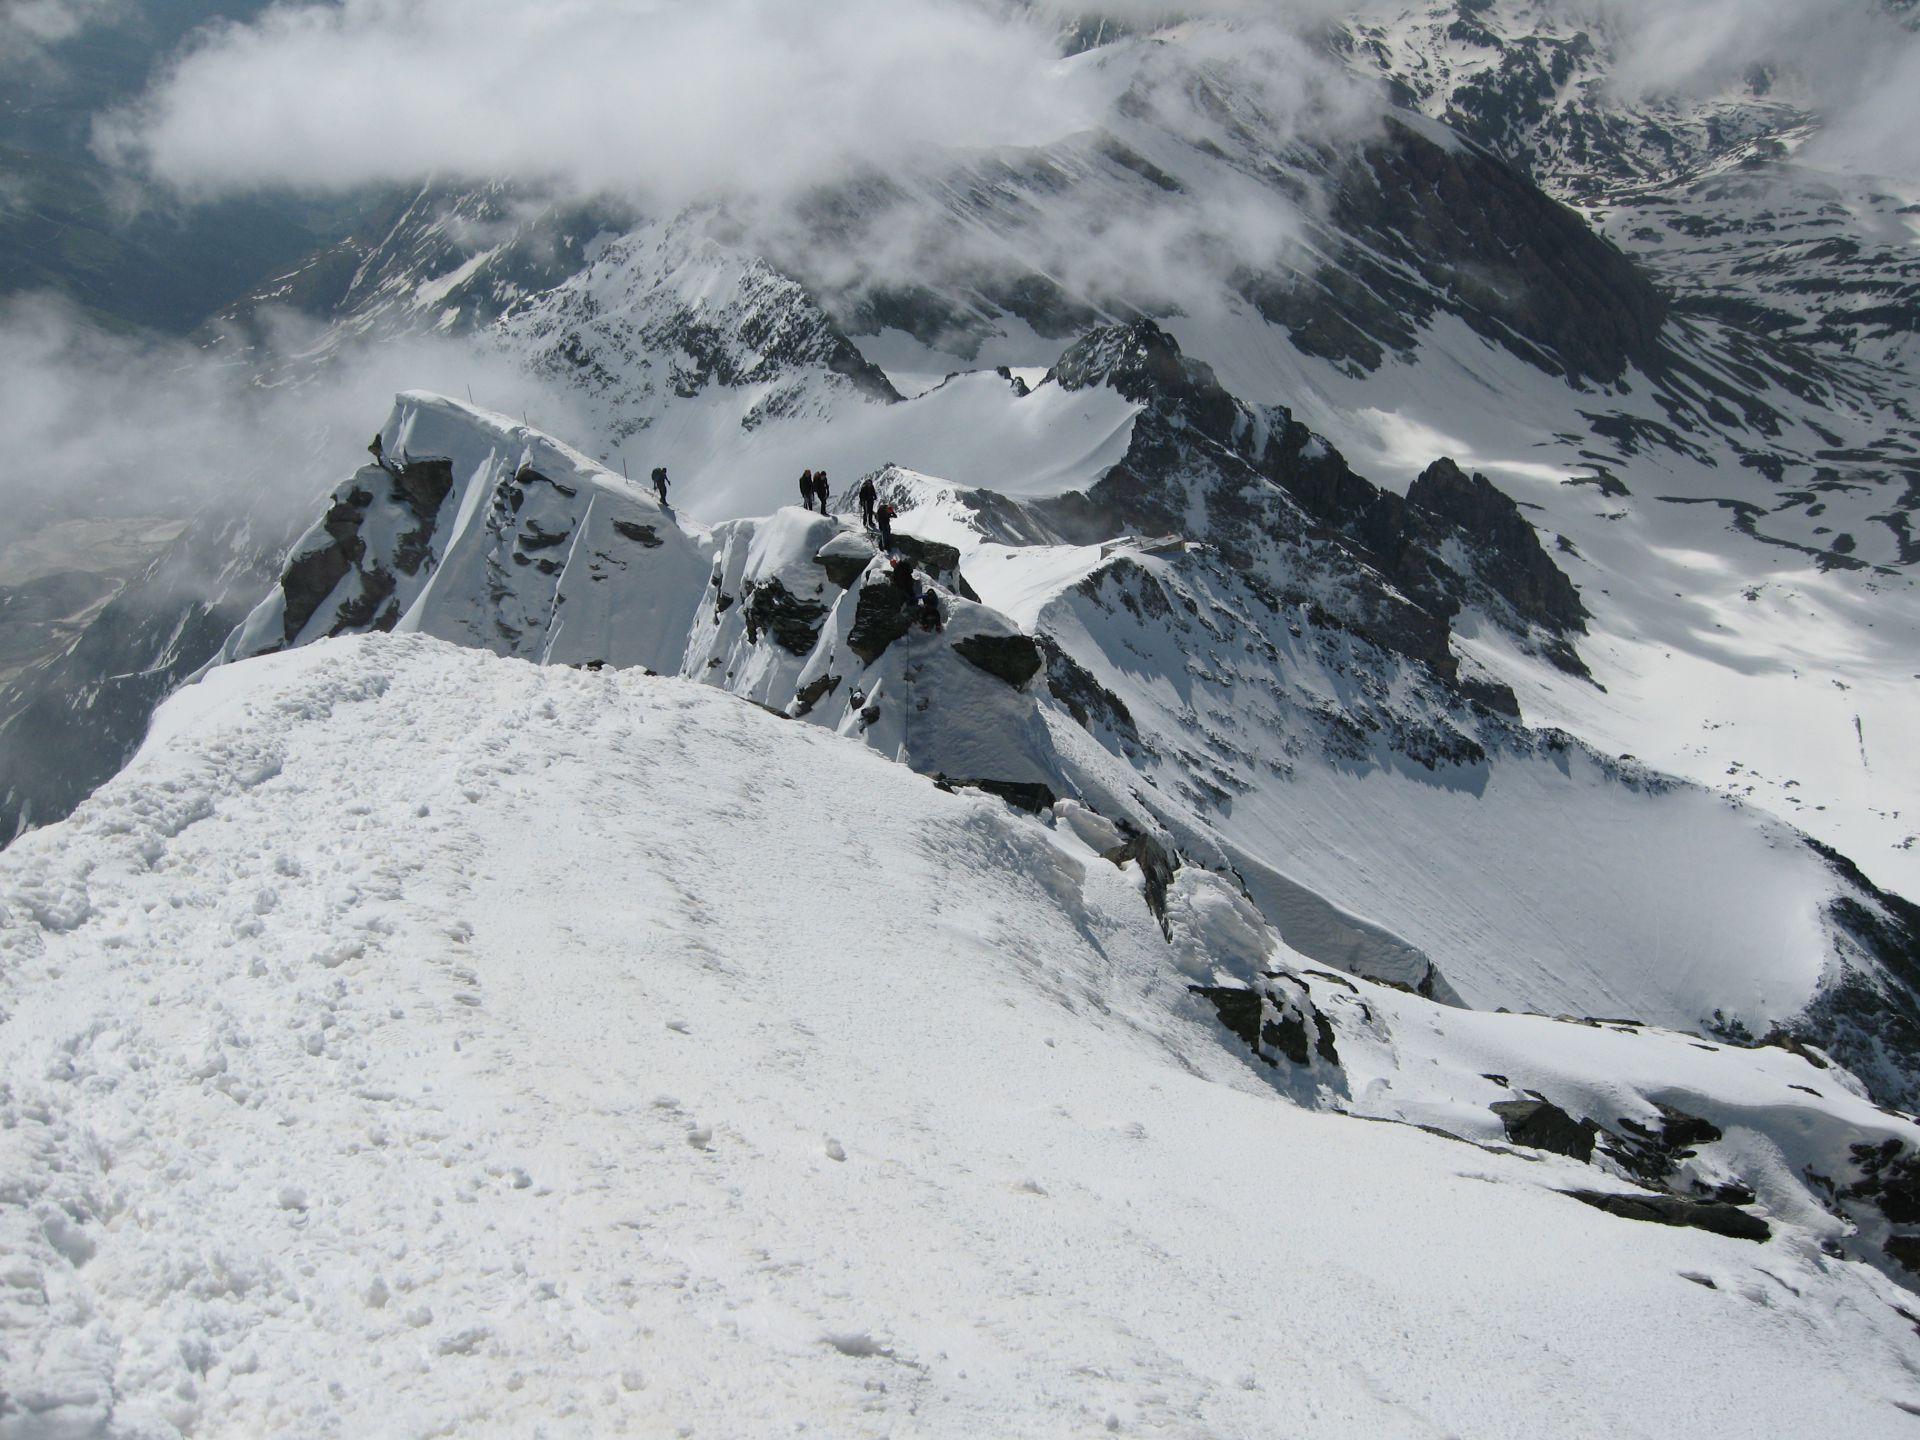 Grossglockner summit 2-day ski touring ascent